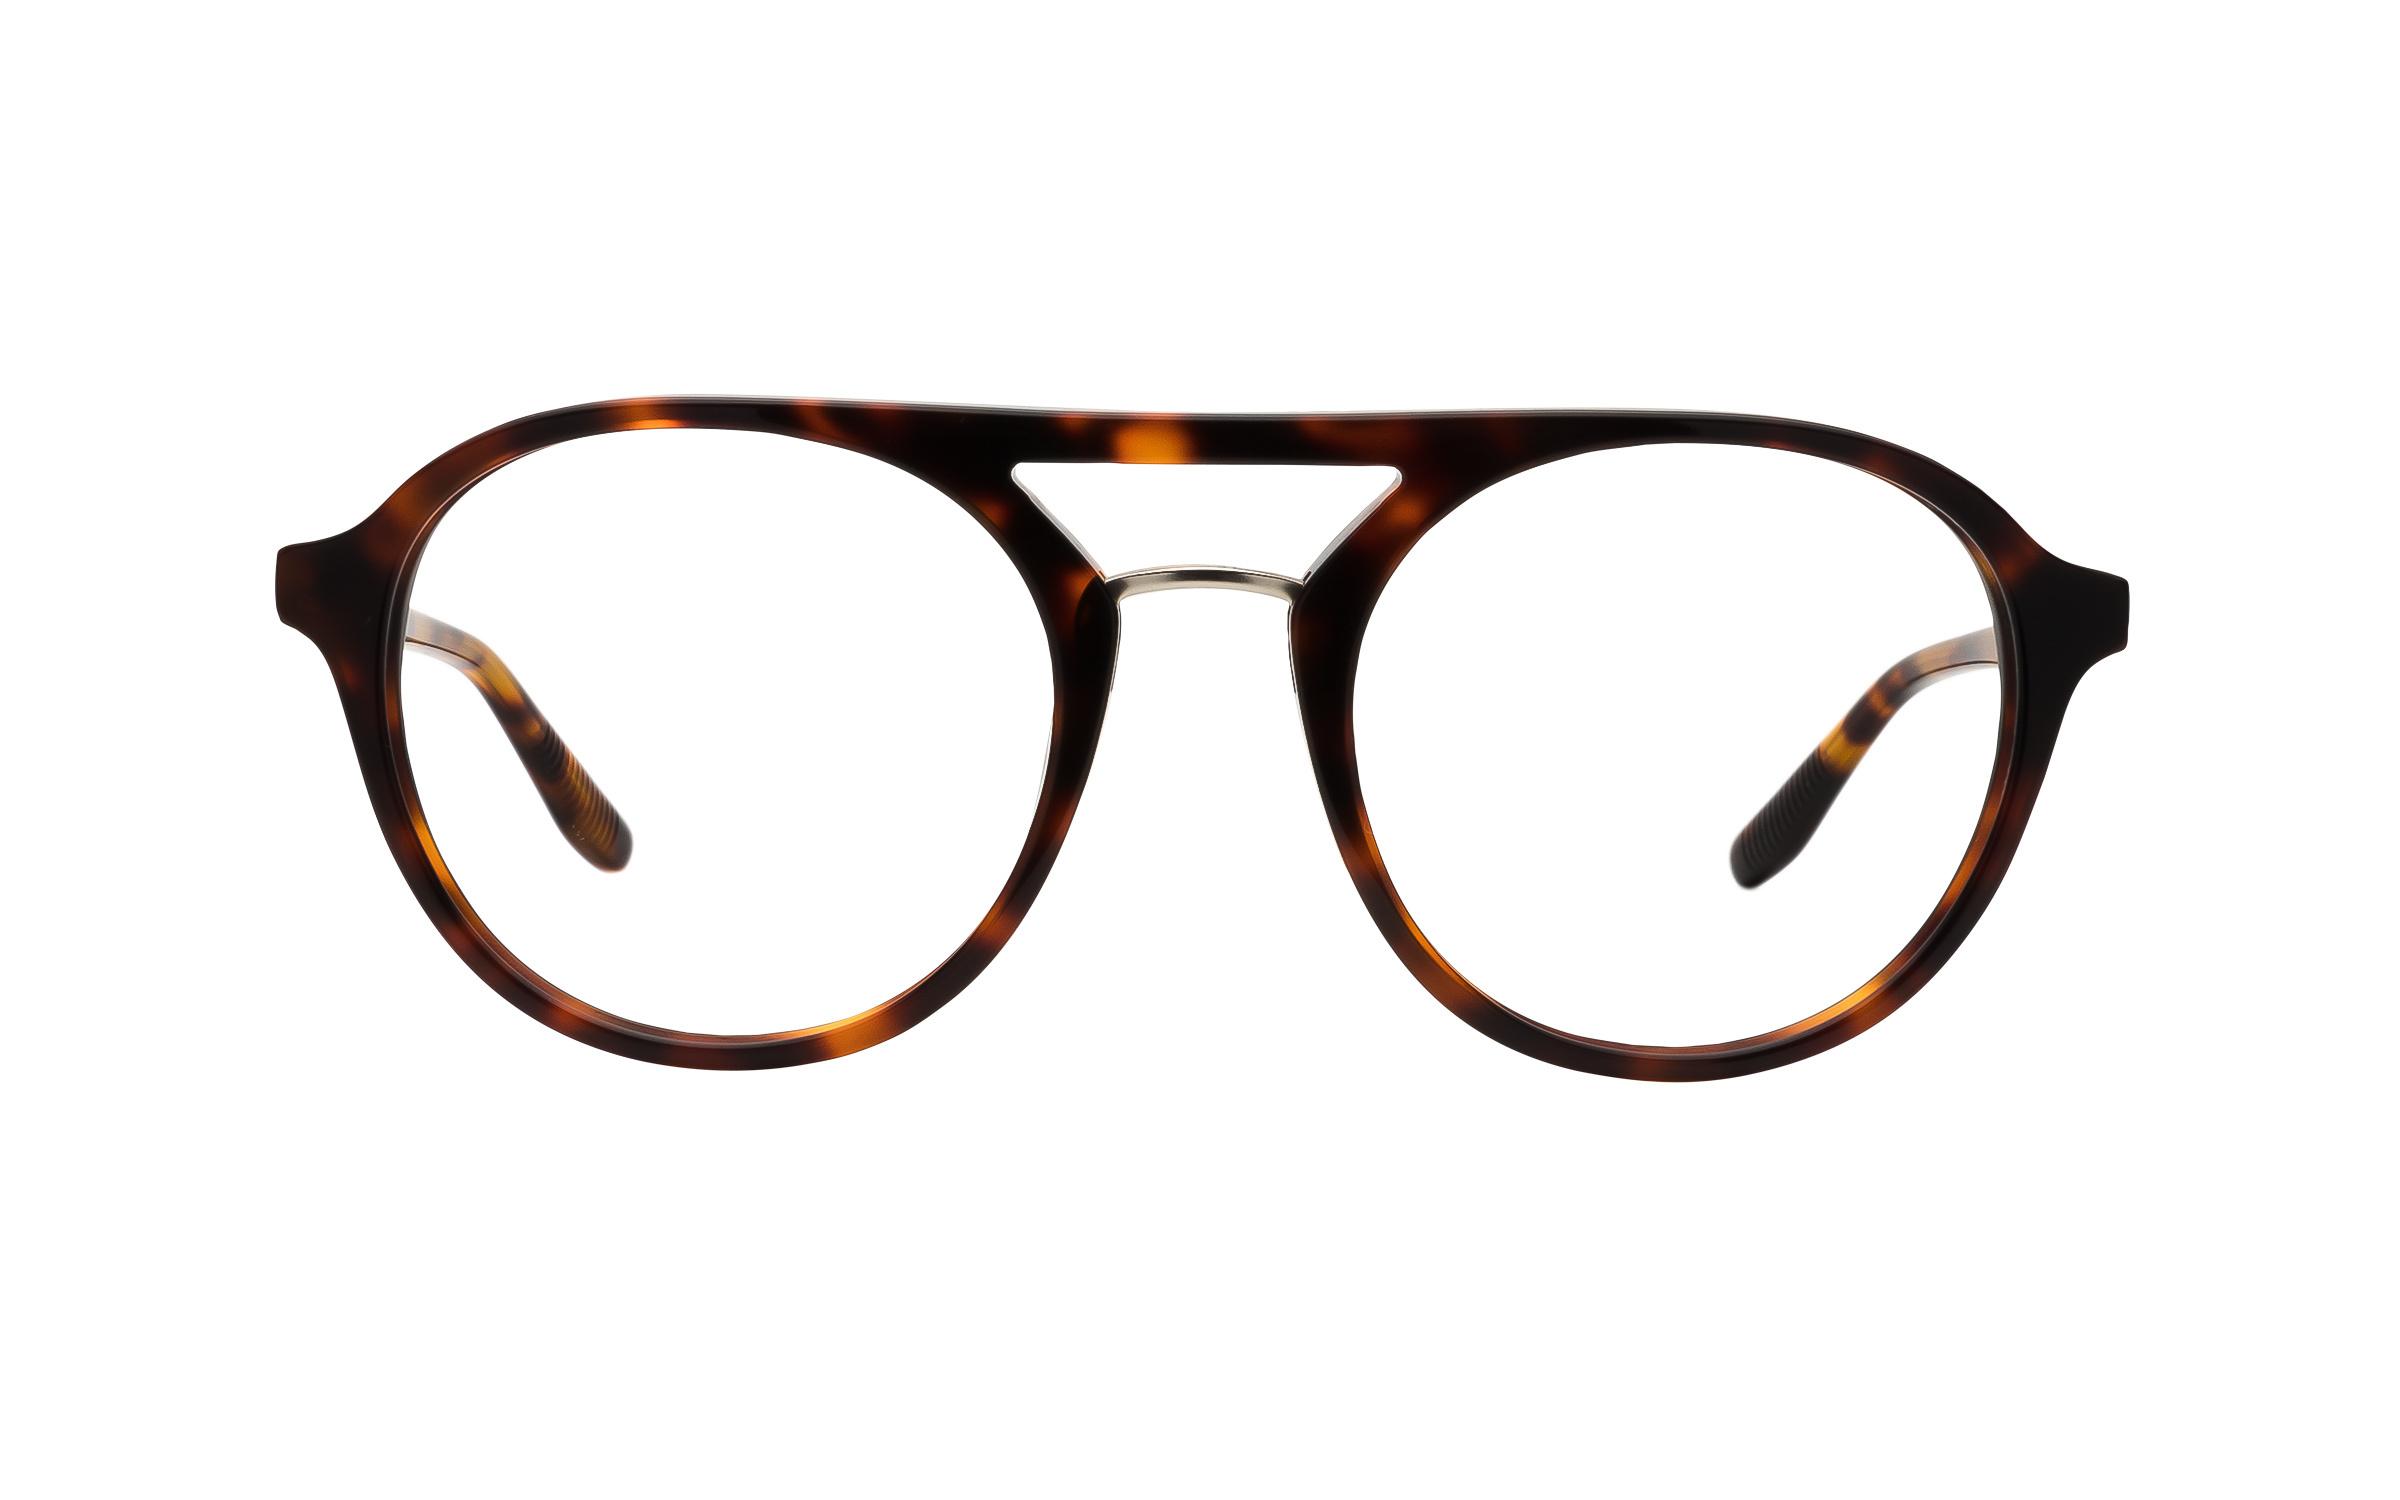 Joseph Marc Men's Glasses Vintage Tortoise/Brown Online Clearly